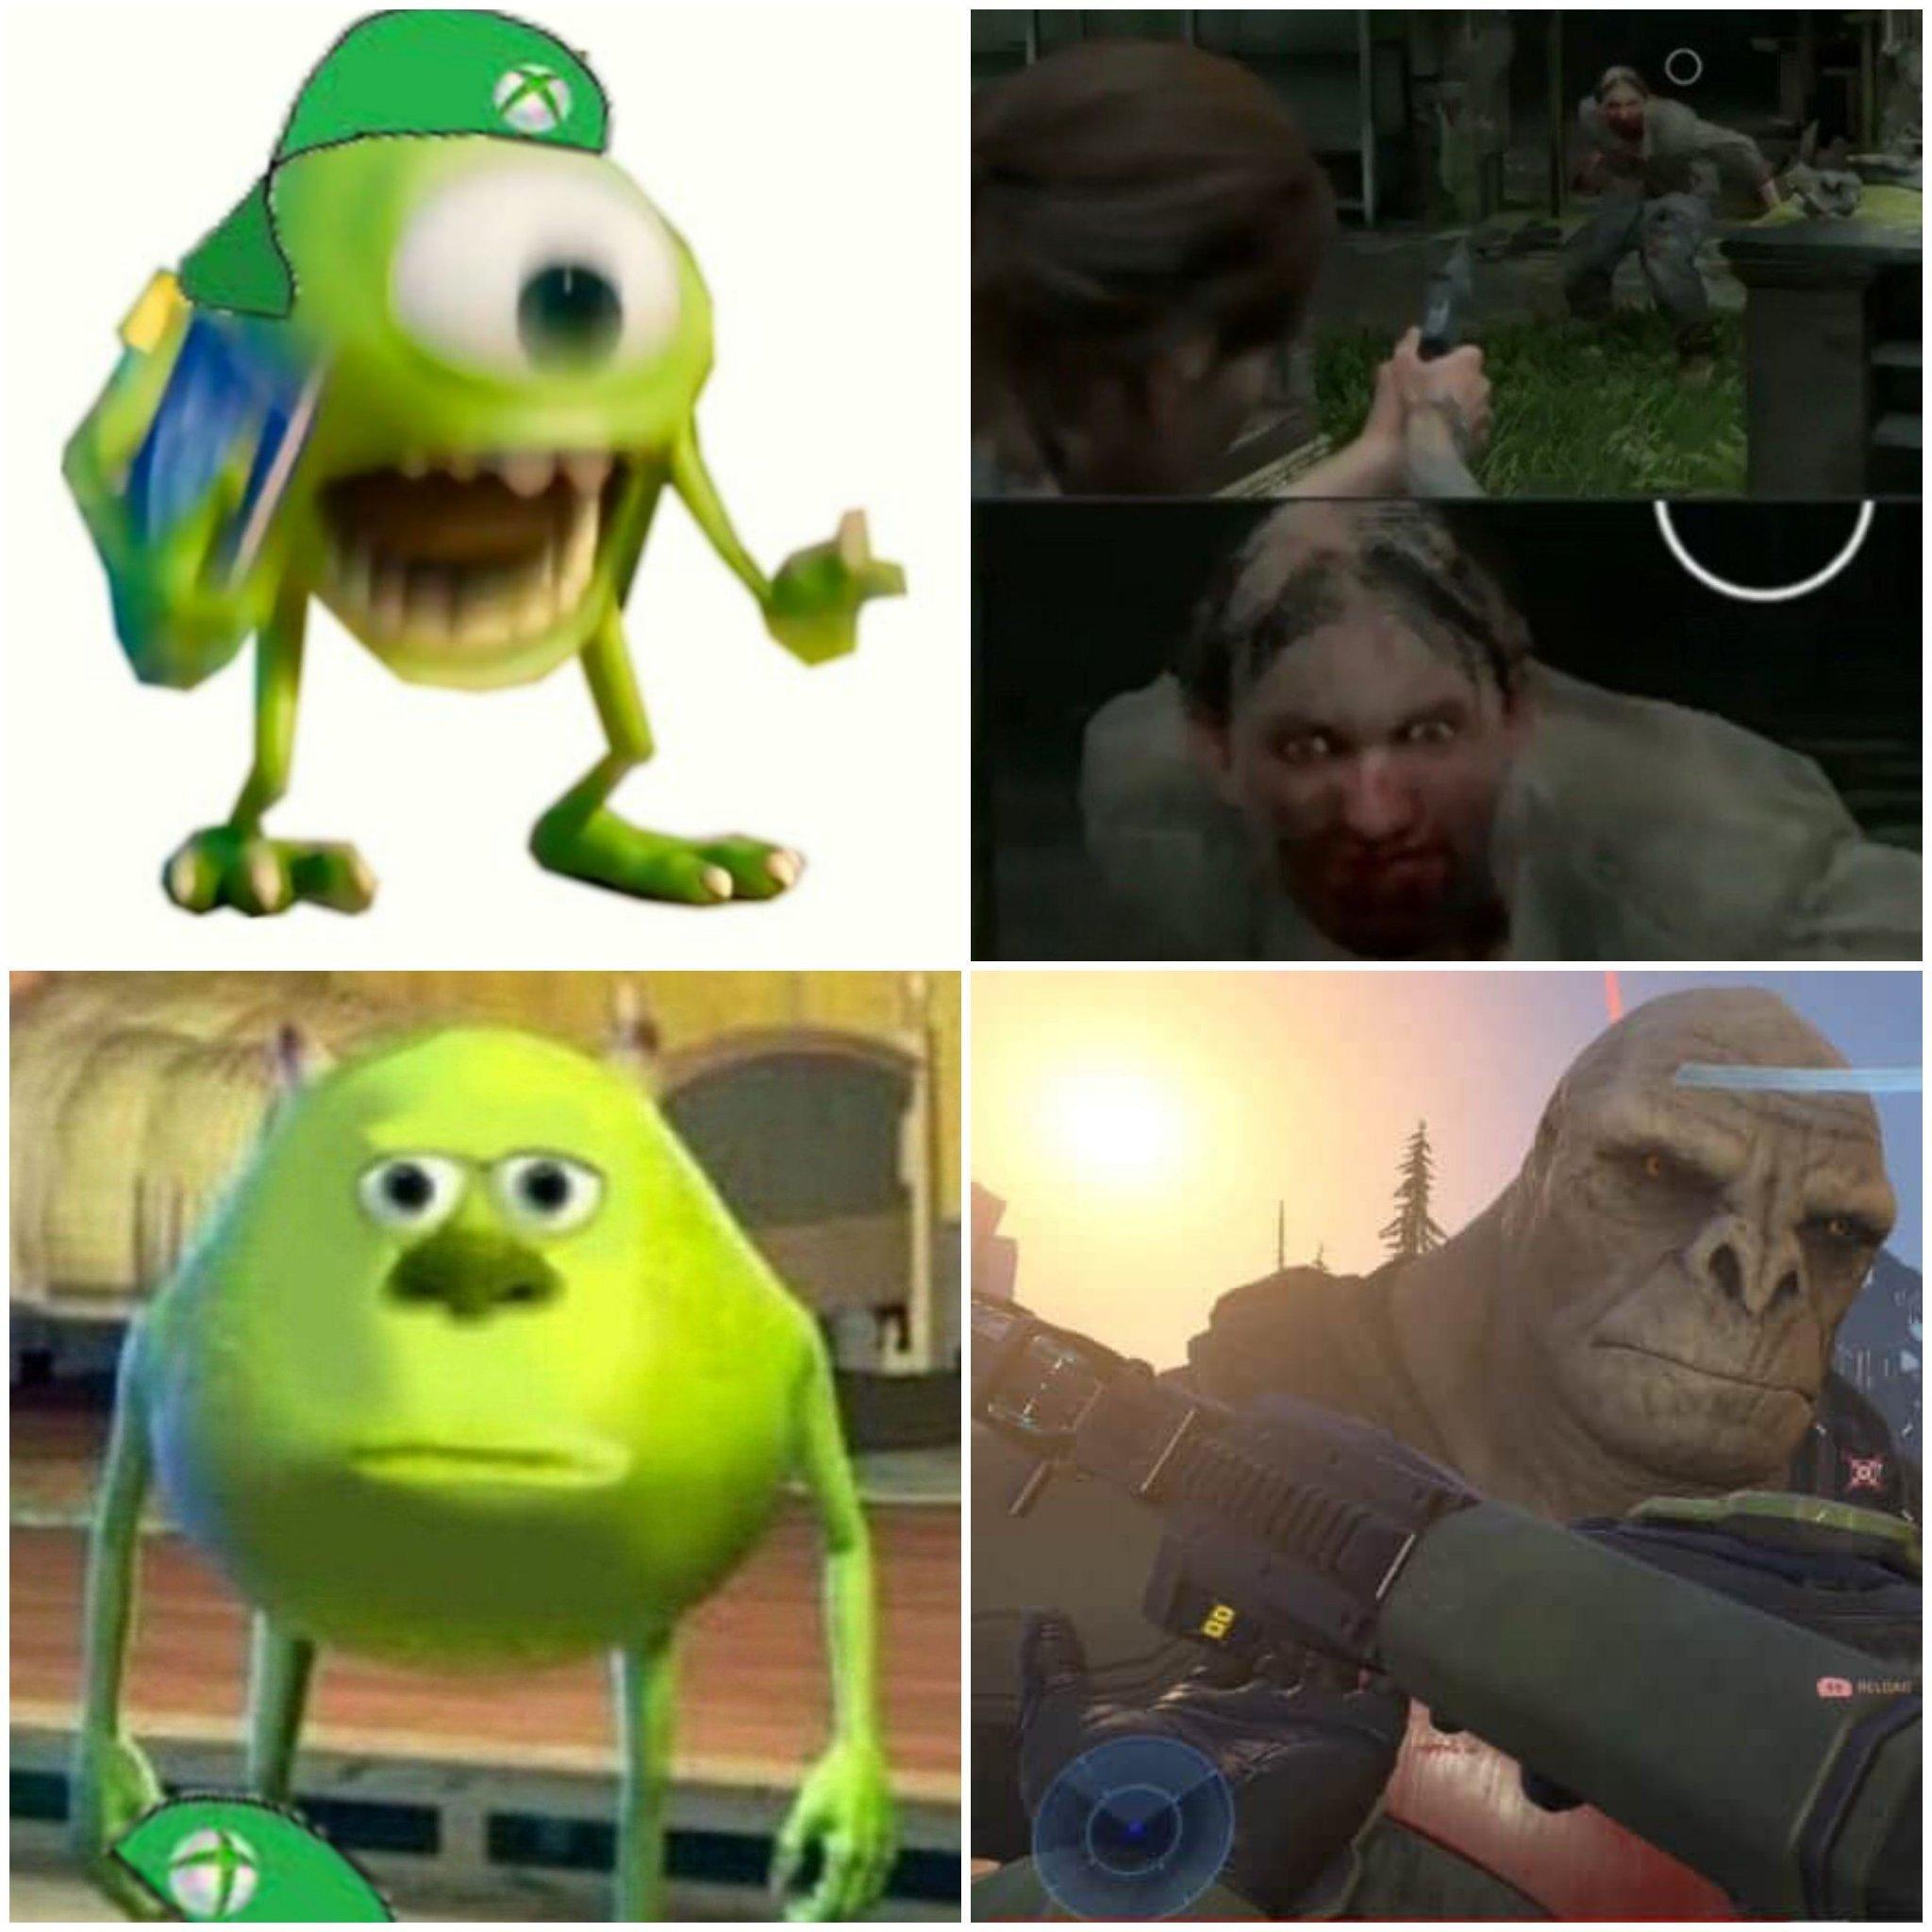 o_o 12 teraflops - meme